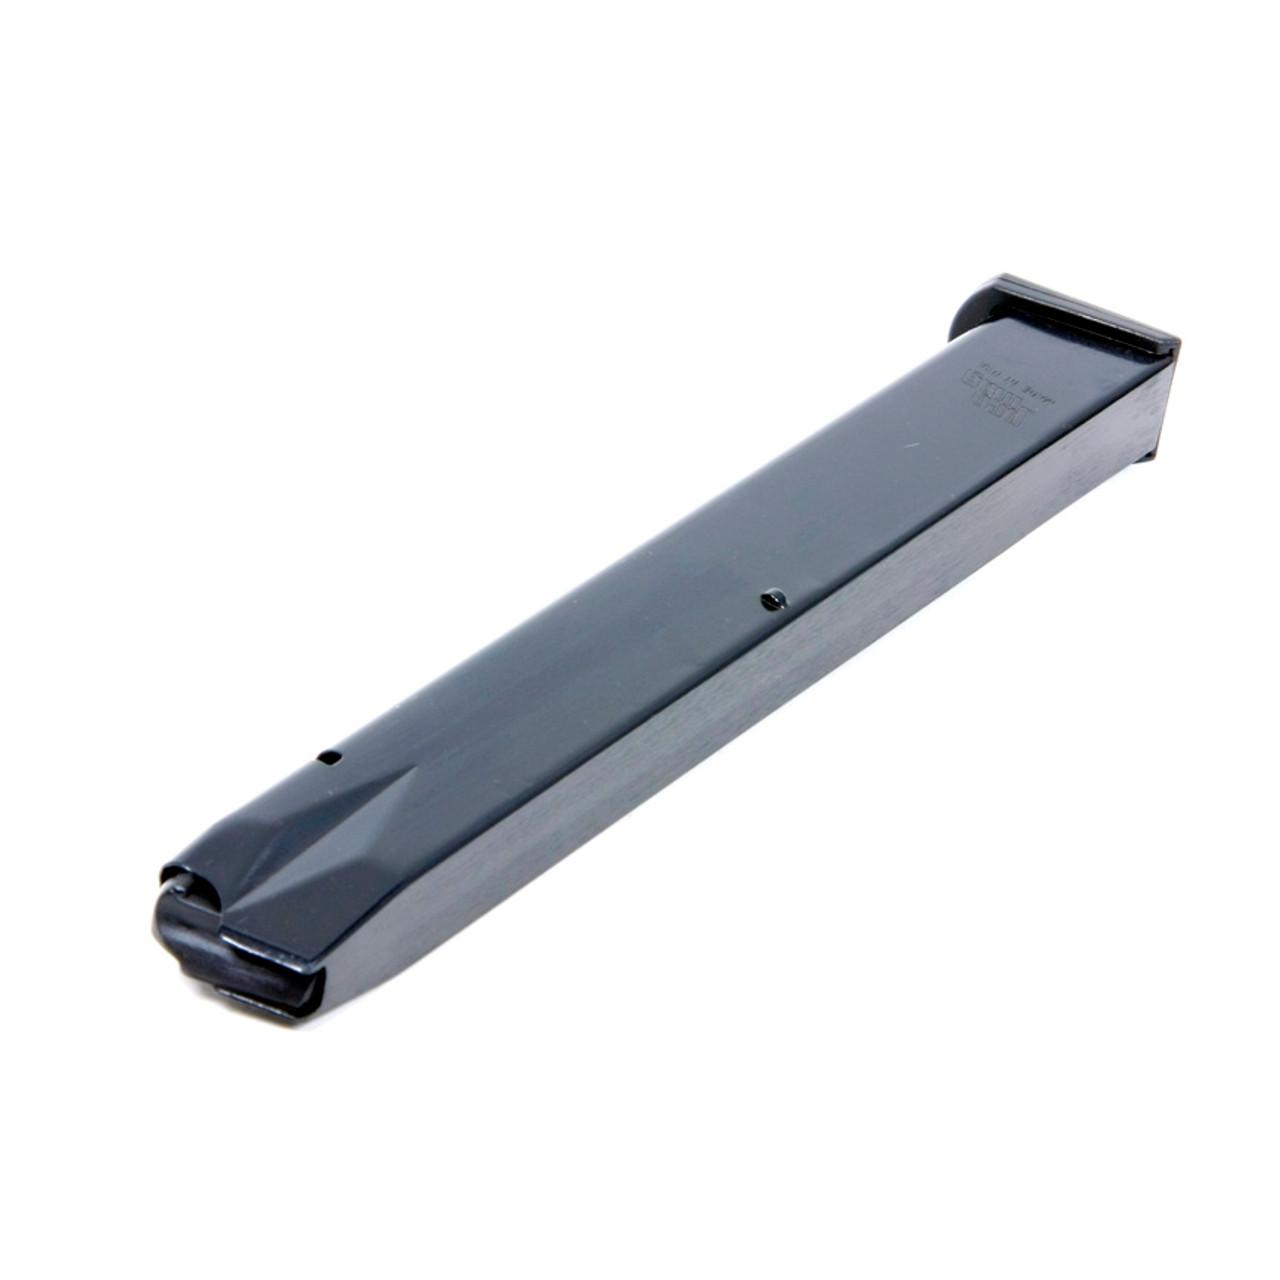 Sig Sauer® P226™ 9mm (32) Rd - Blue Steel